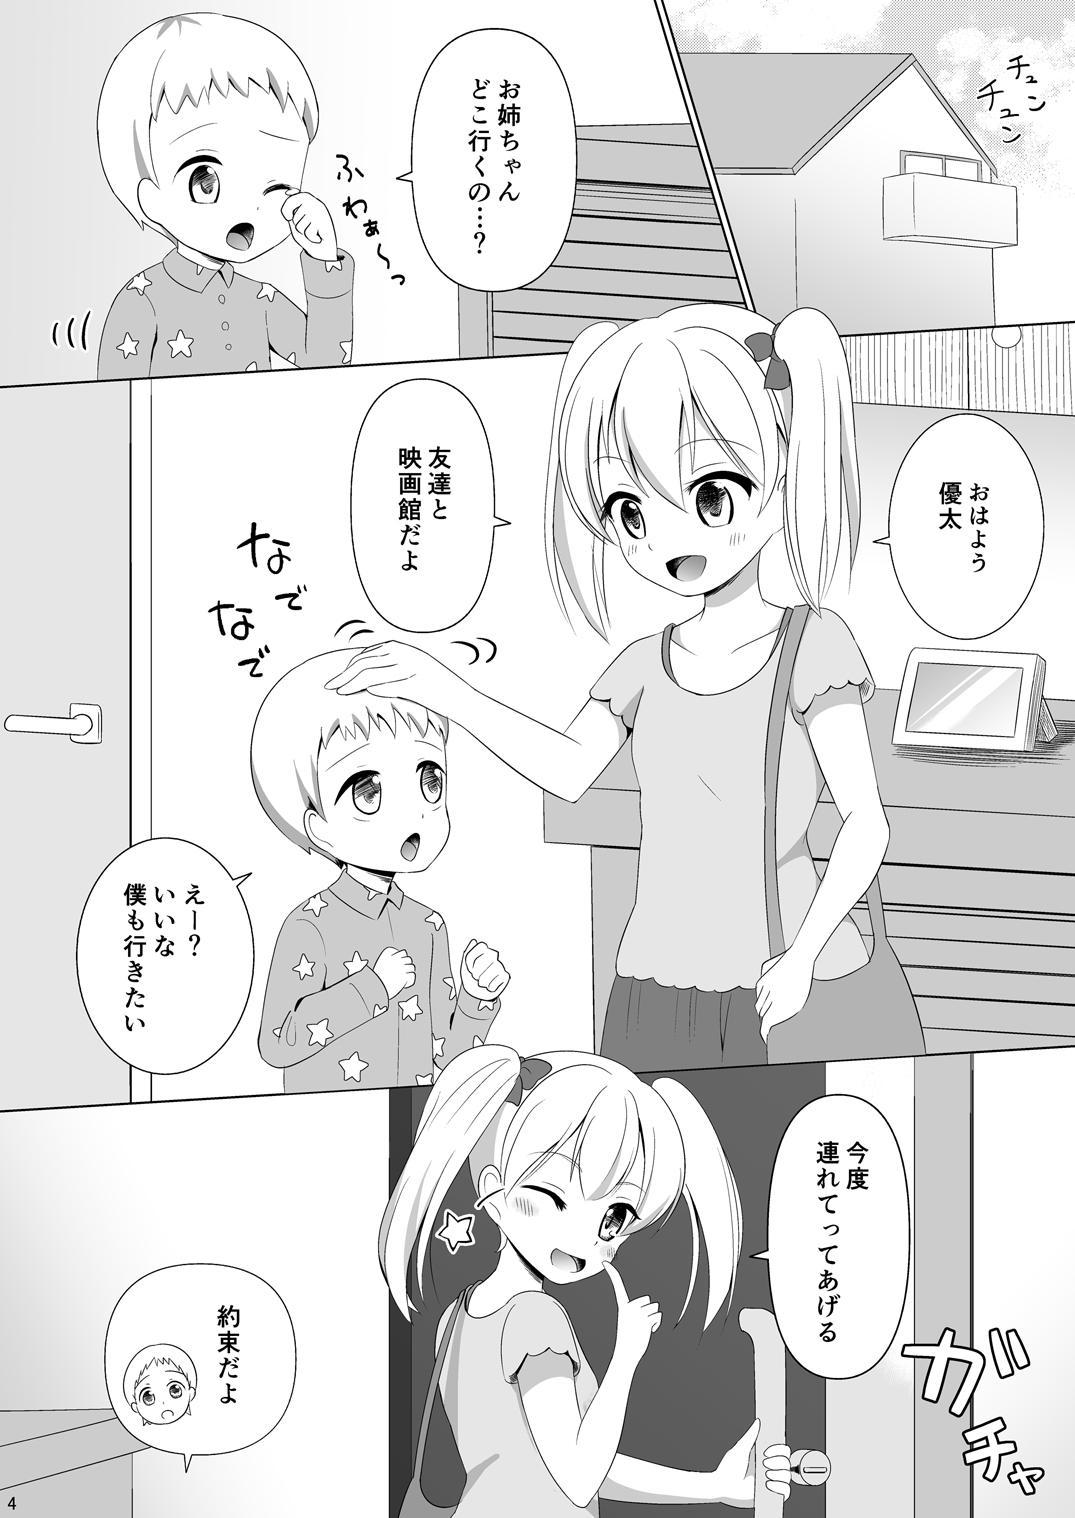 Mesuana Roshutsu Gakuen Daisanwa 3